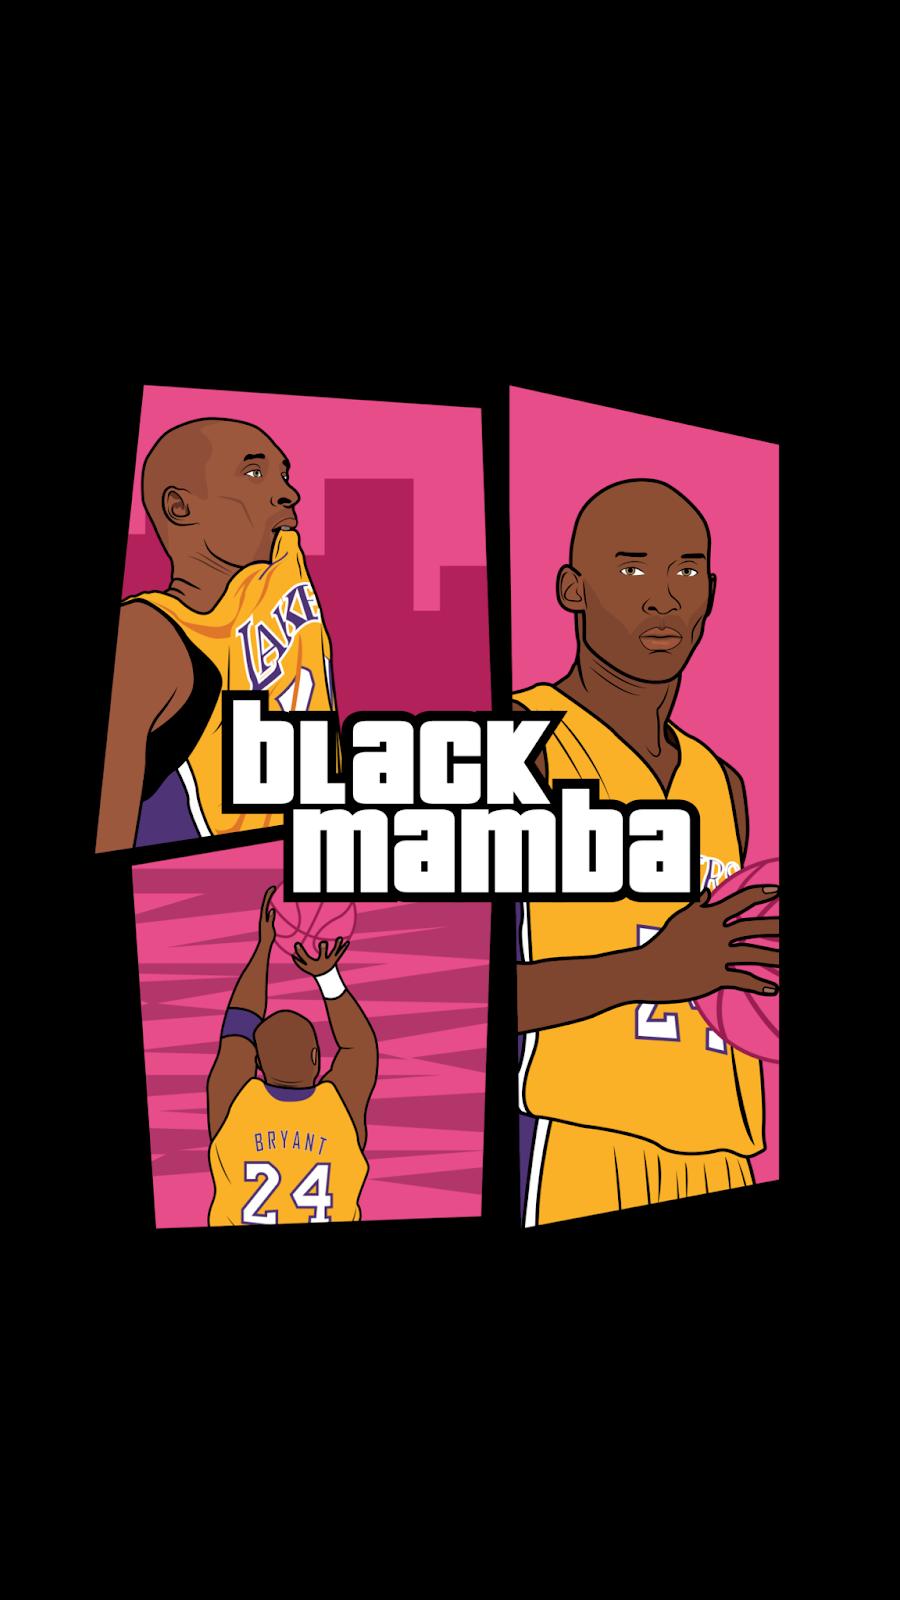 Kobe Bryant Cool Wallpapers For Phone In 2020 Kobe Bryant Wallpaper Kobe Bryant Kobe Bryant Pictures